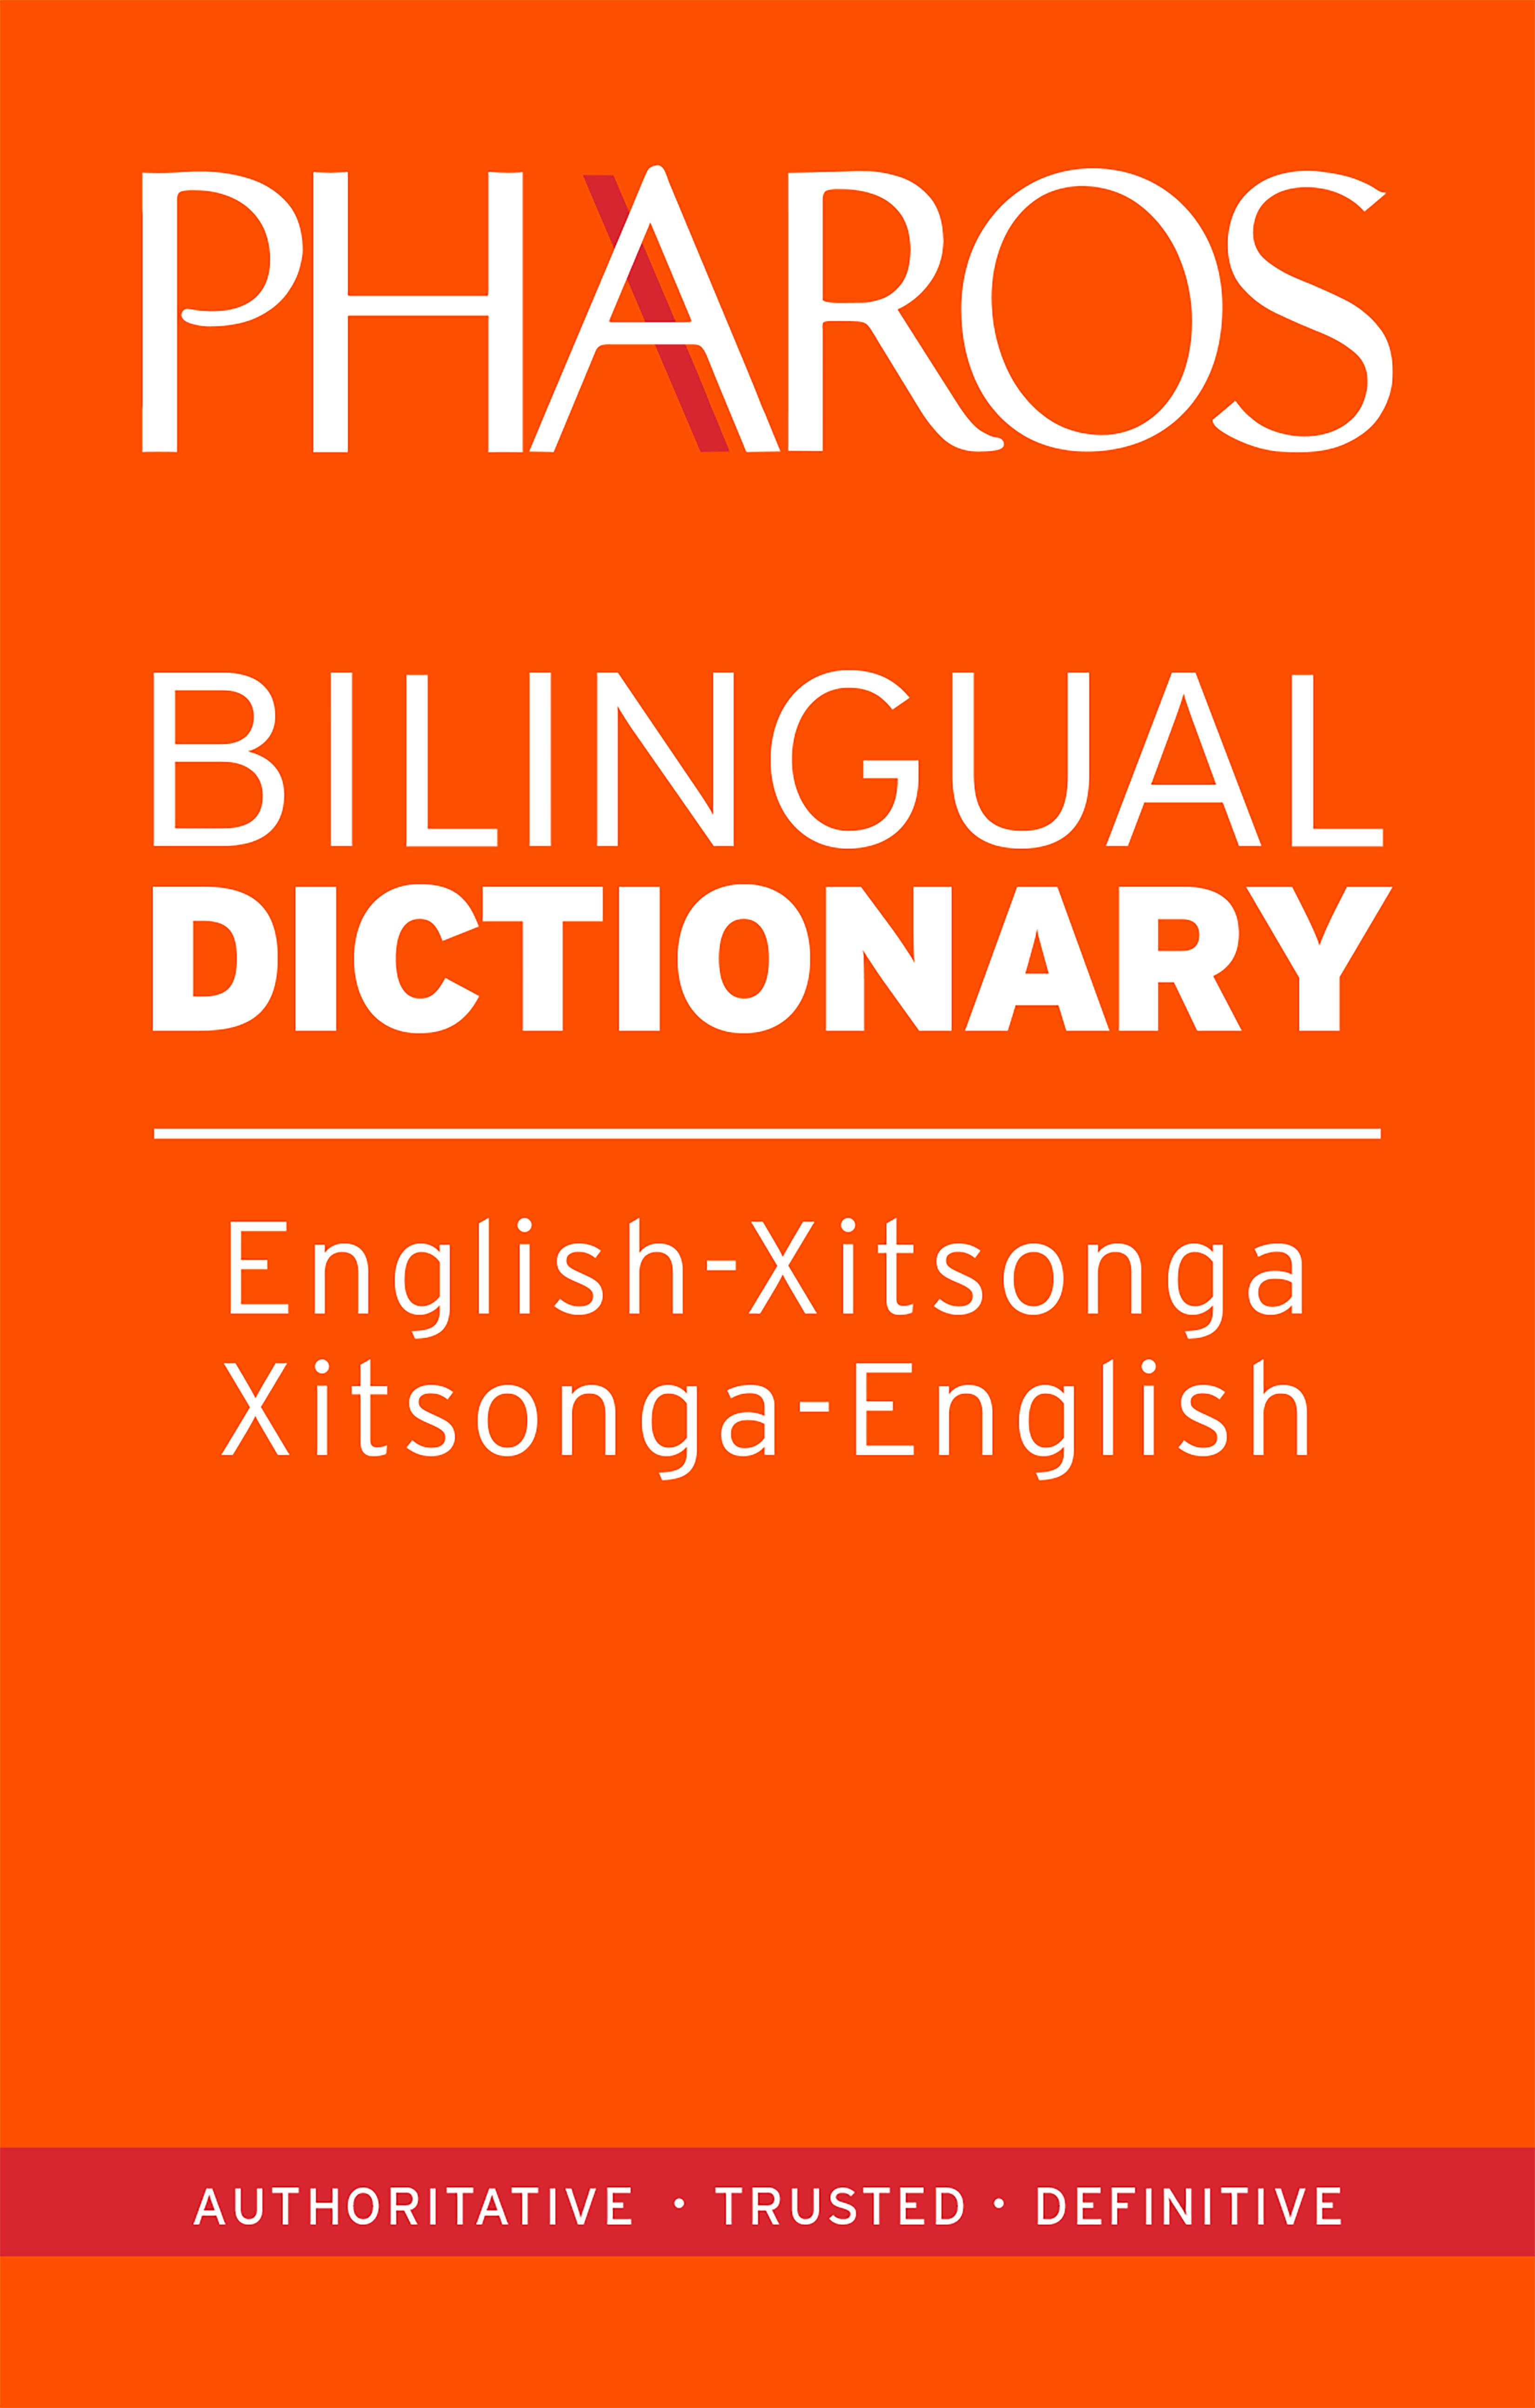 Pharos English-Xitsonga/Xitsonga-English Bilingual Dictionary